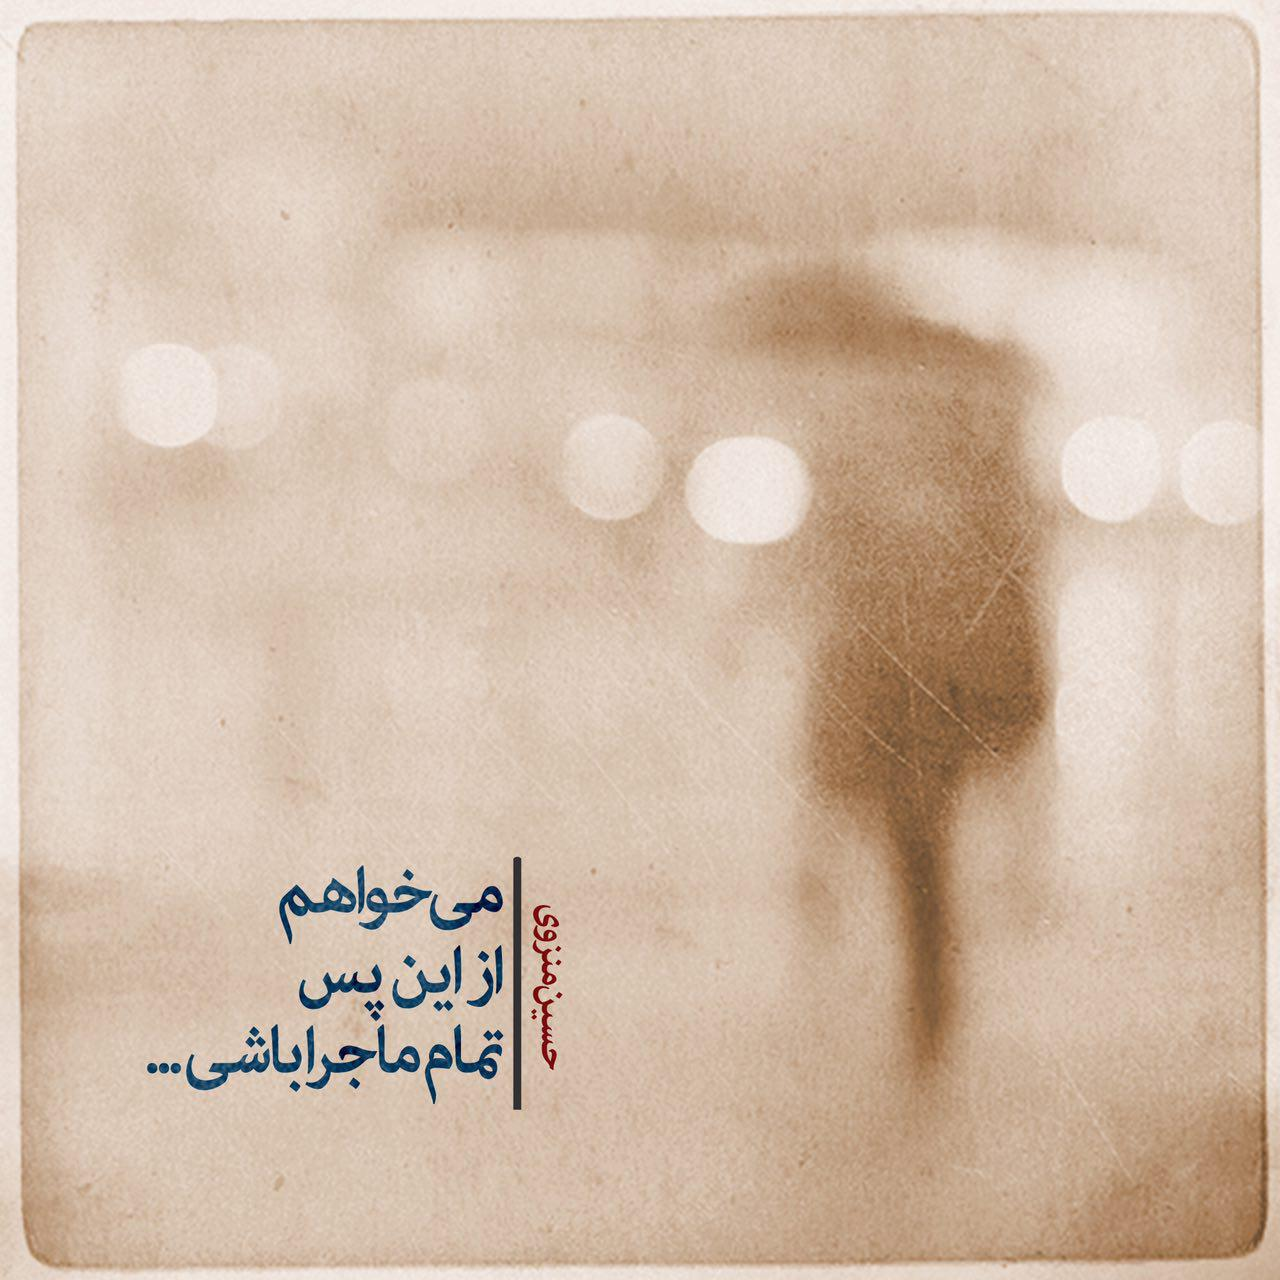 جملات عاشقانه حسین منزوی